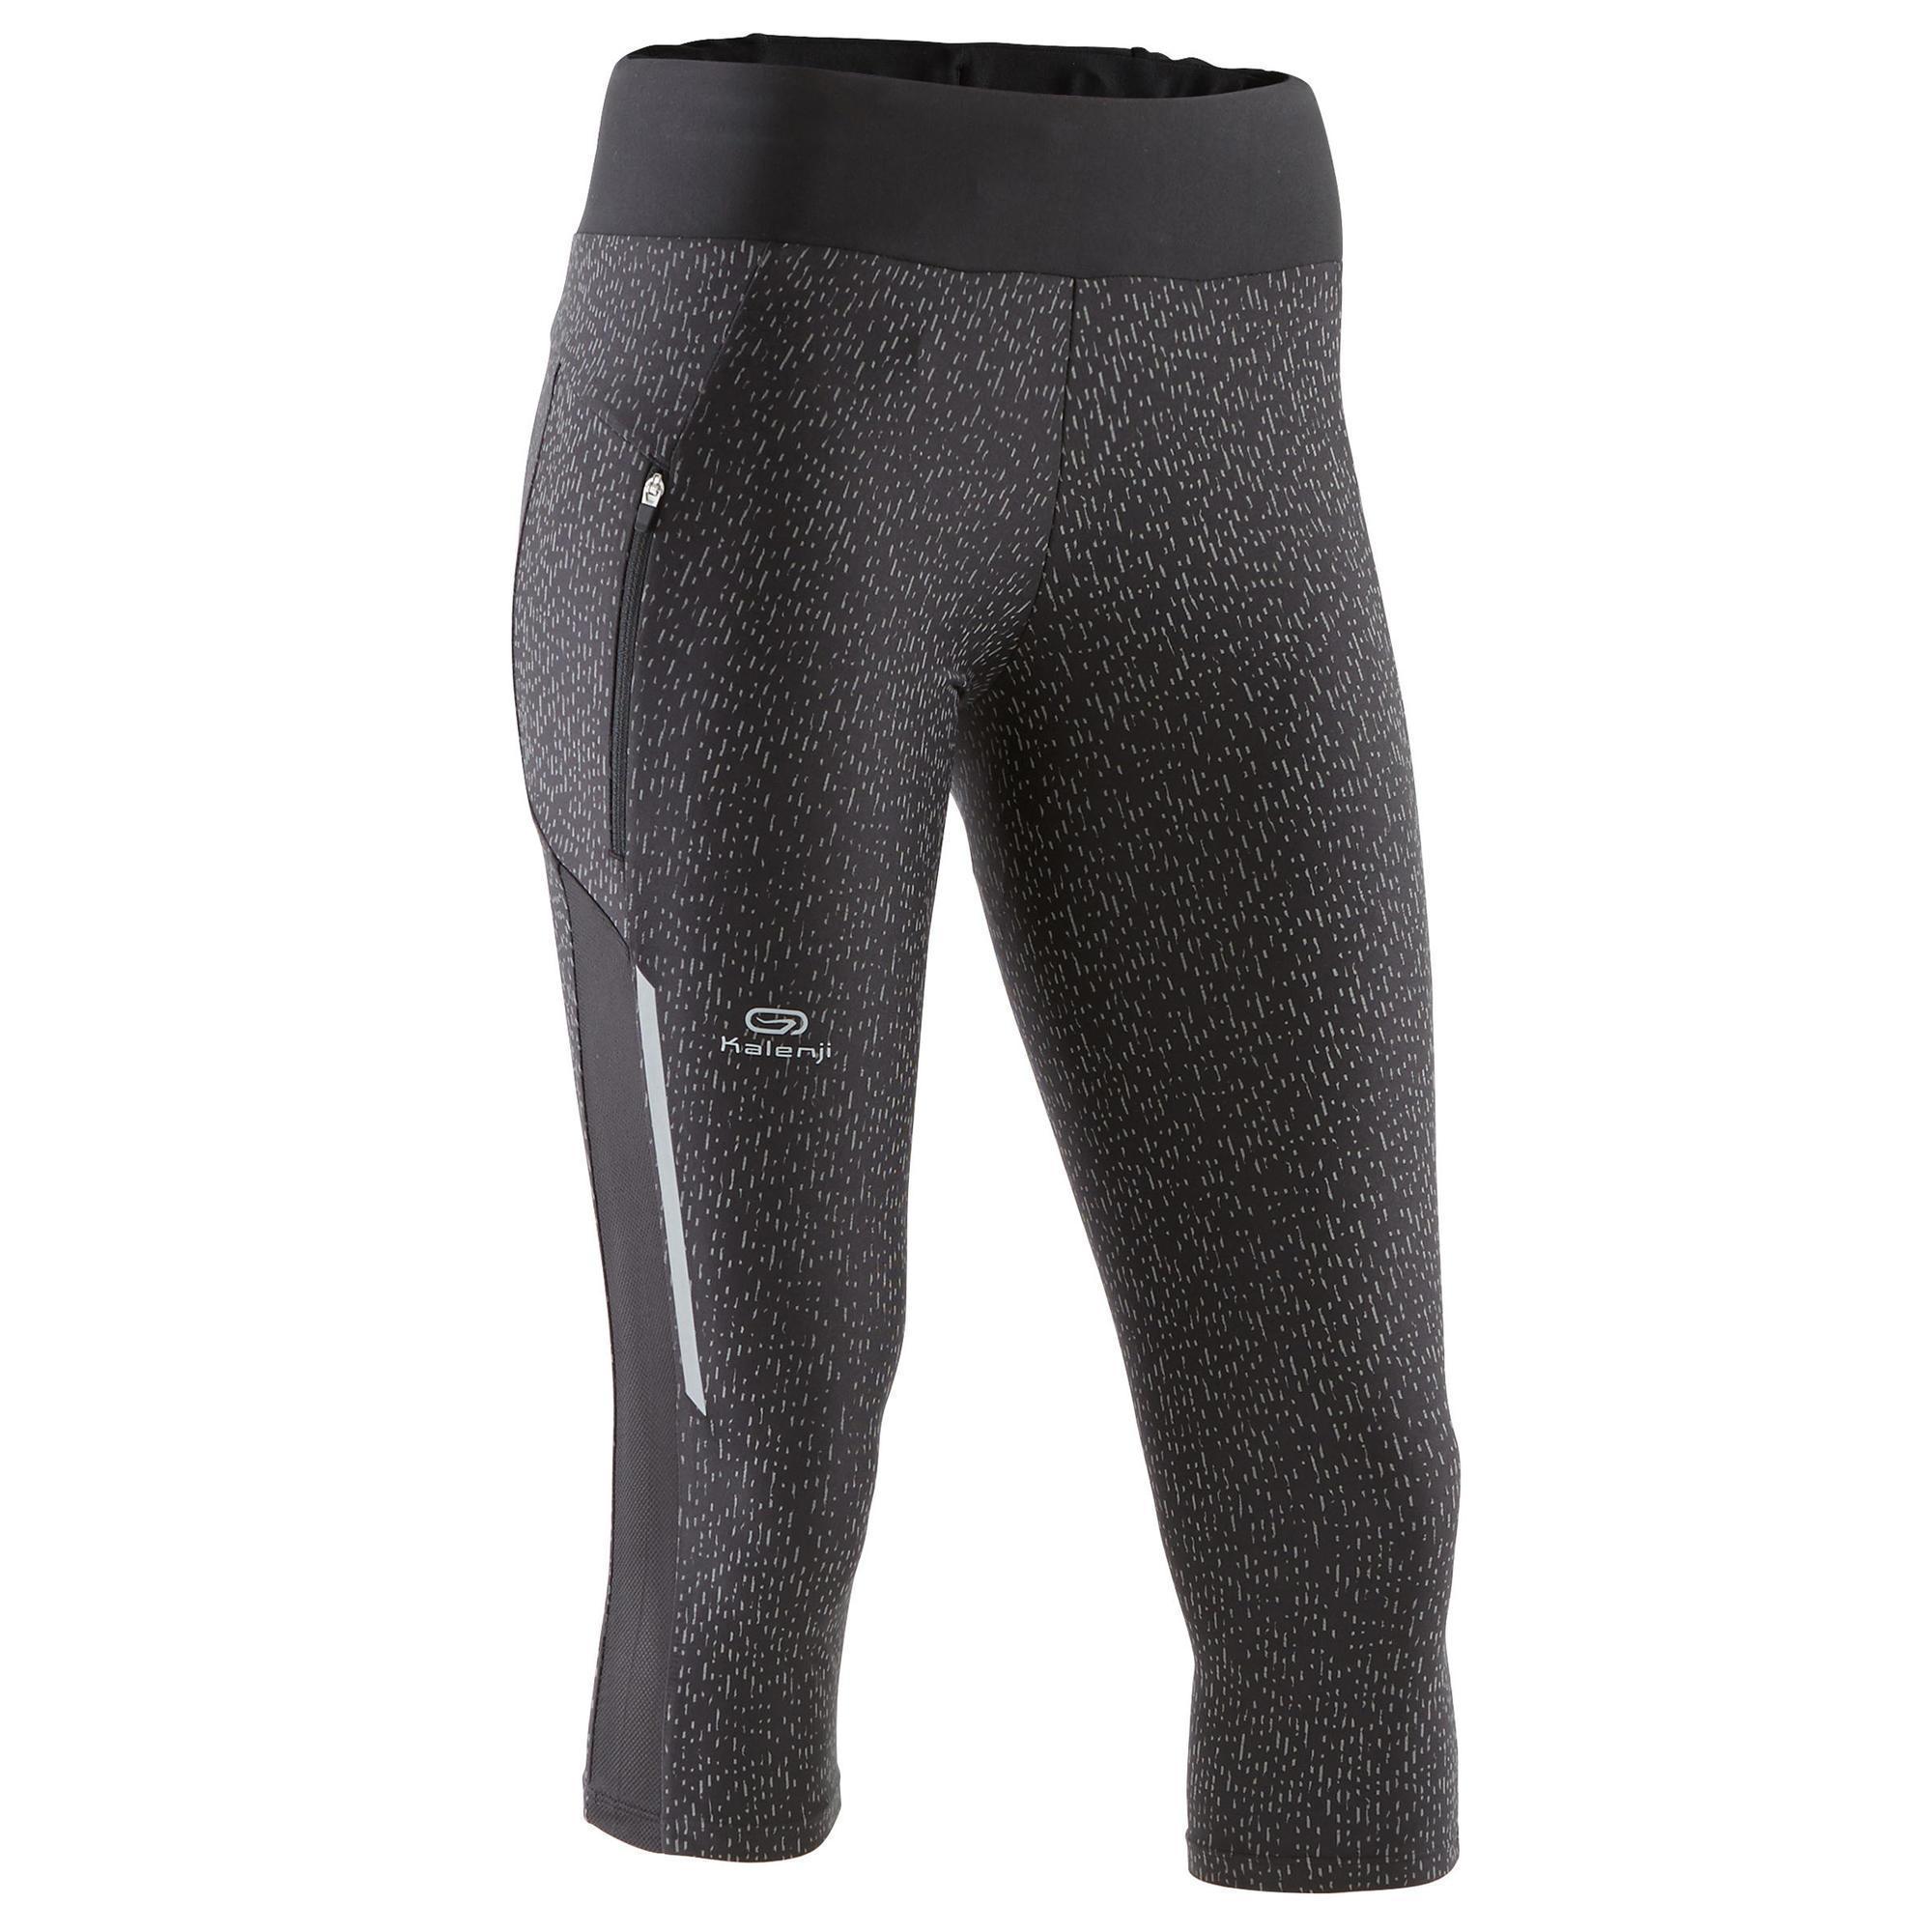 Kalenji Kuitbroek jogging dames Run Dry+ Reflect zwart